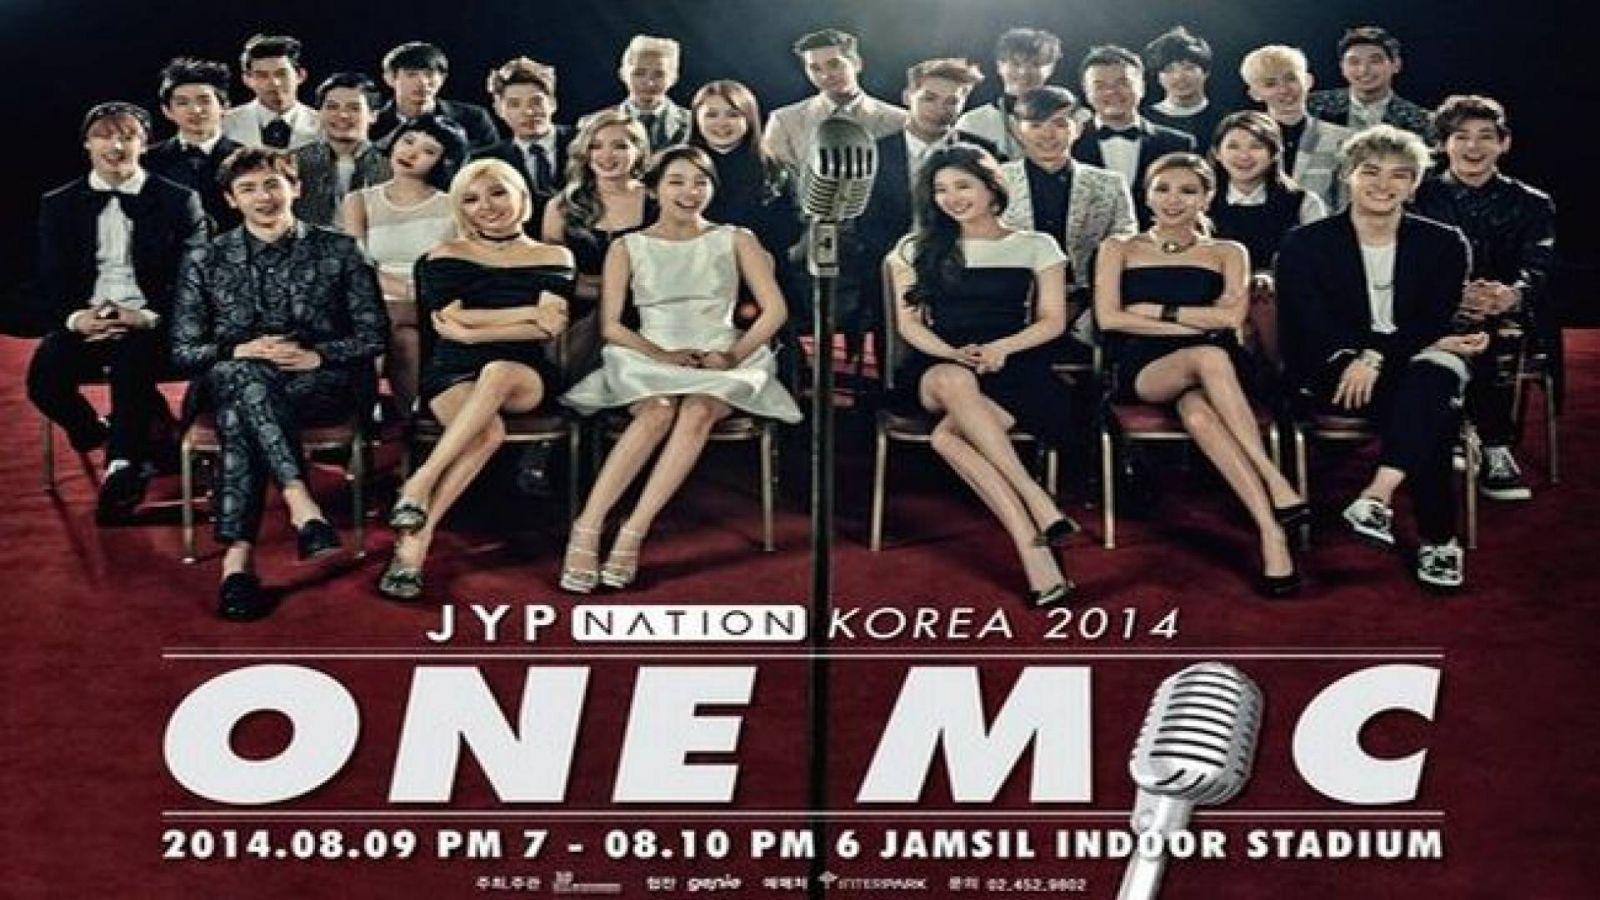 2014 JYP NATION - ONE MIC tour © JYP Entertainment